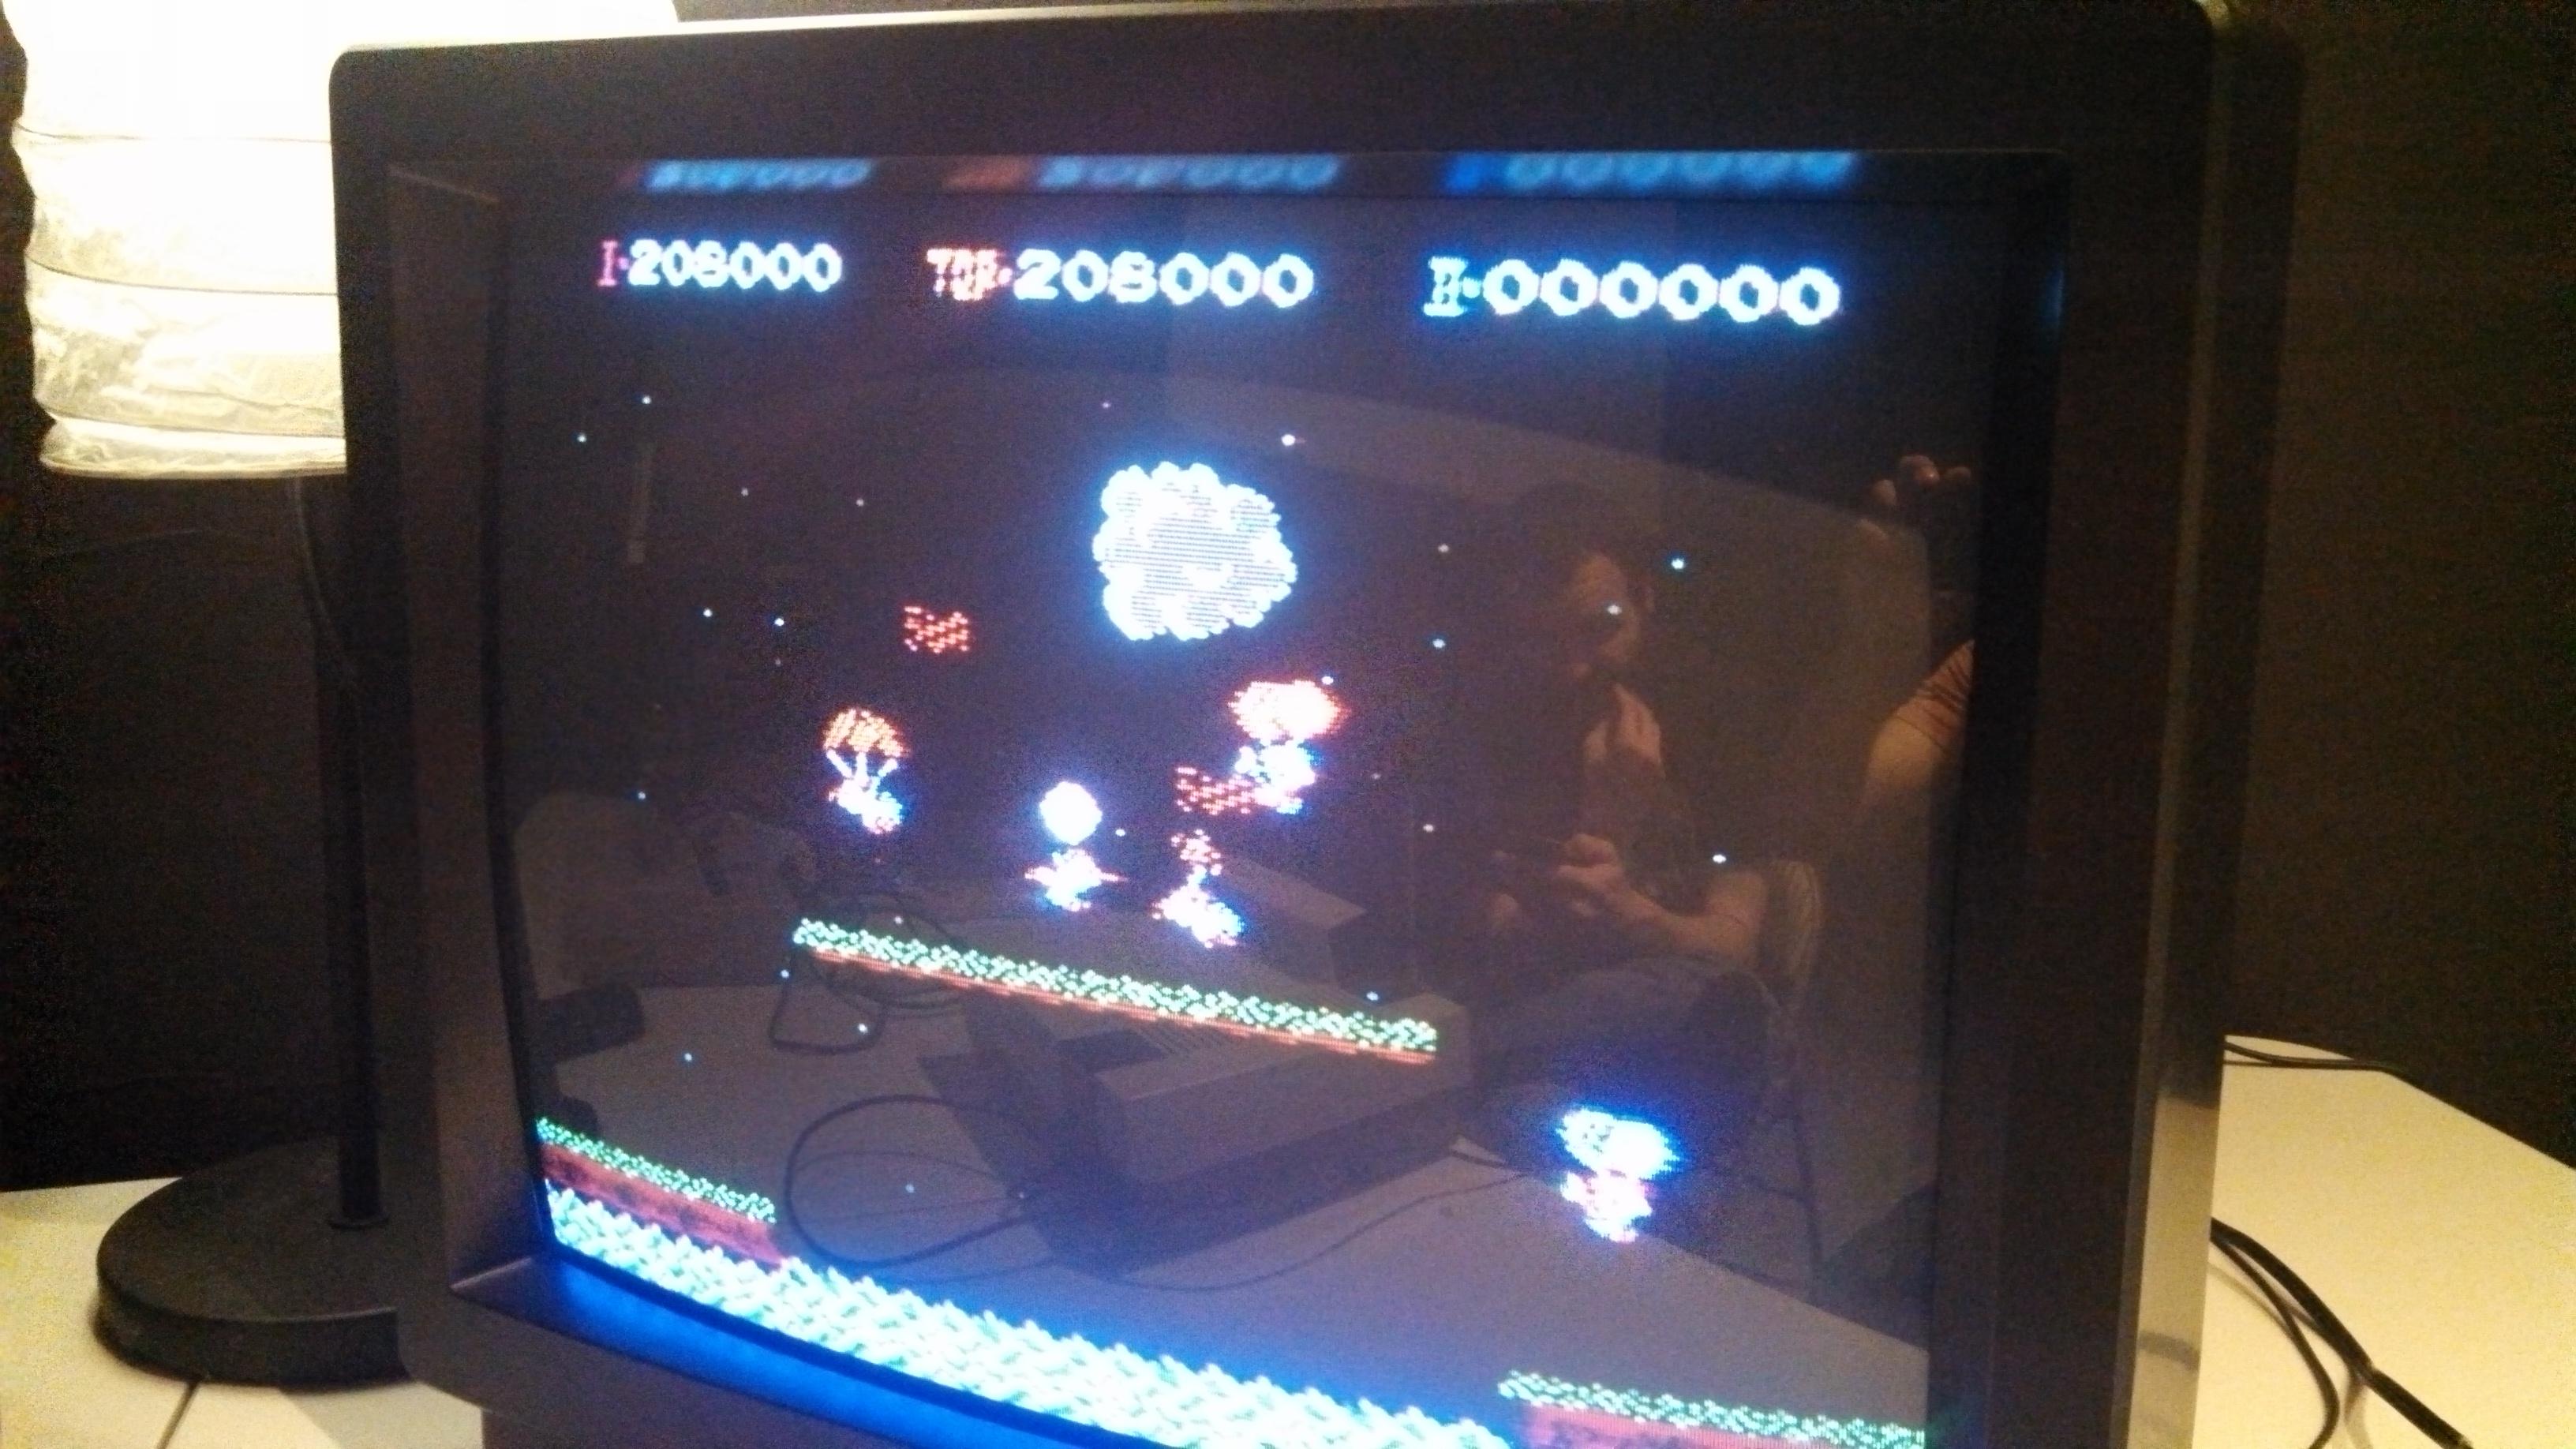 videogameporn: Balloon Fight (NES/Famicom) 208,000 points on 2014-05-11 18:51:05